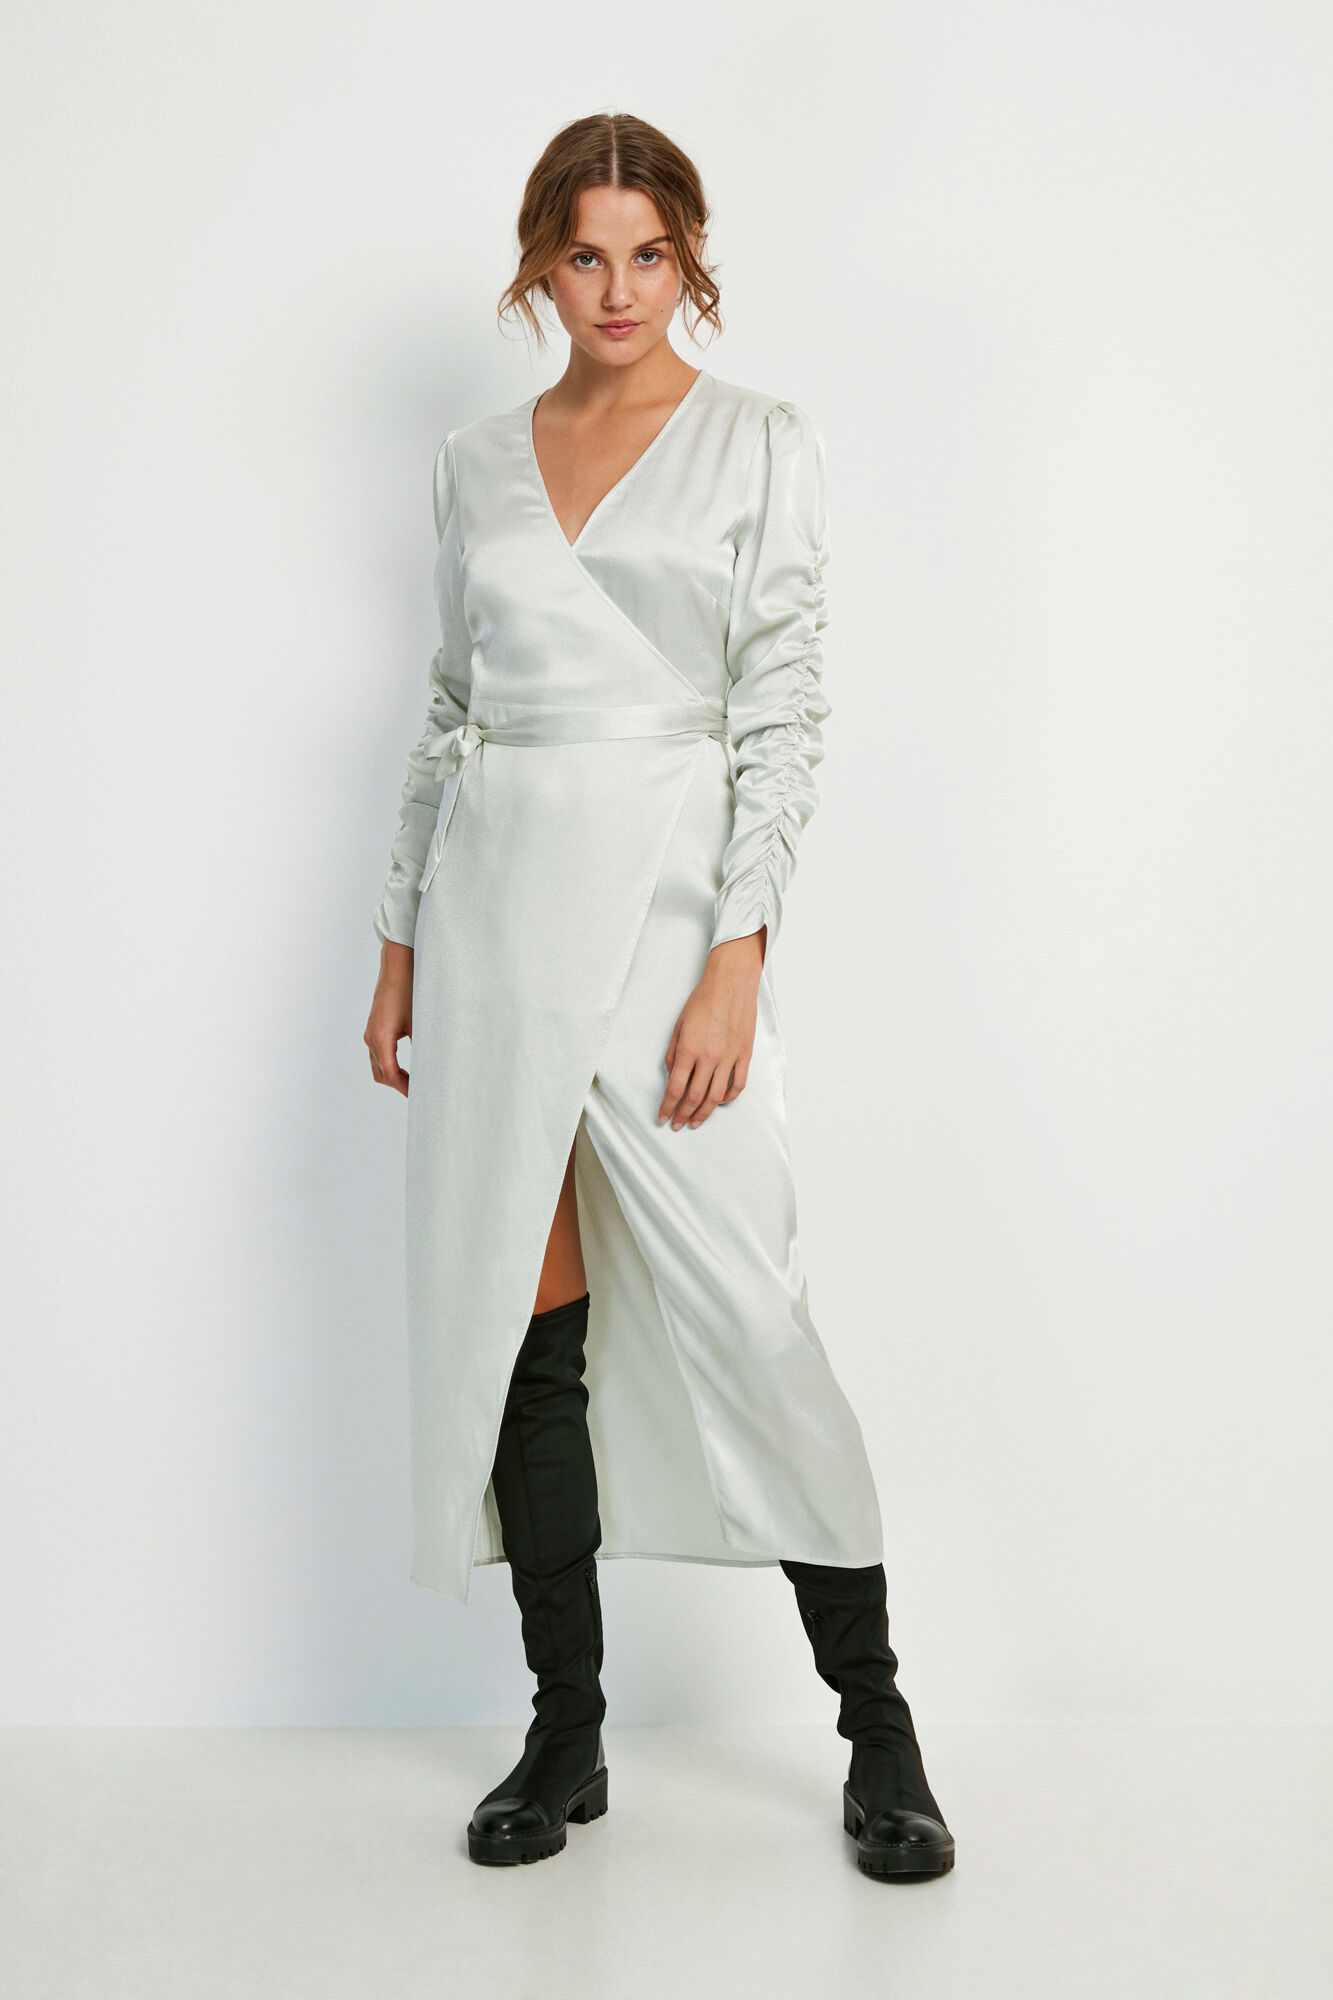 ENBIANCA LS DRESS 6613